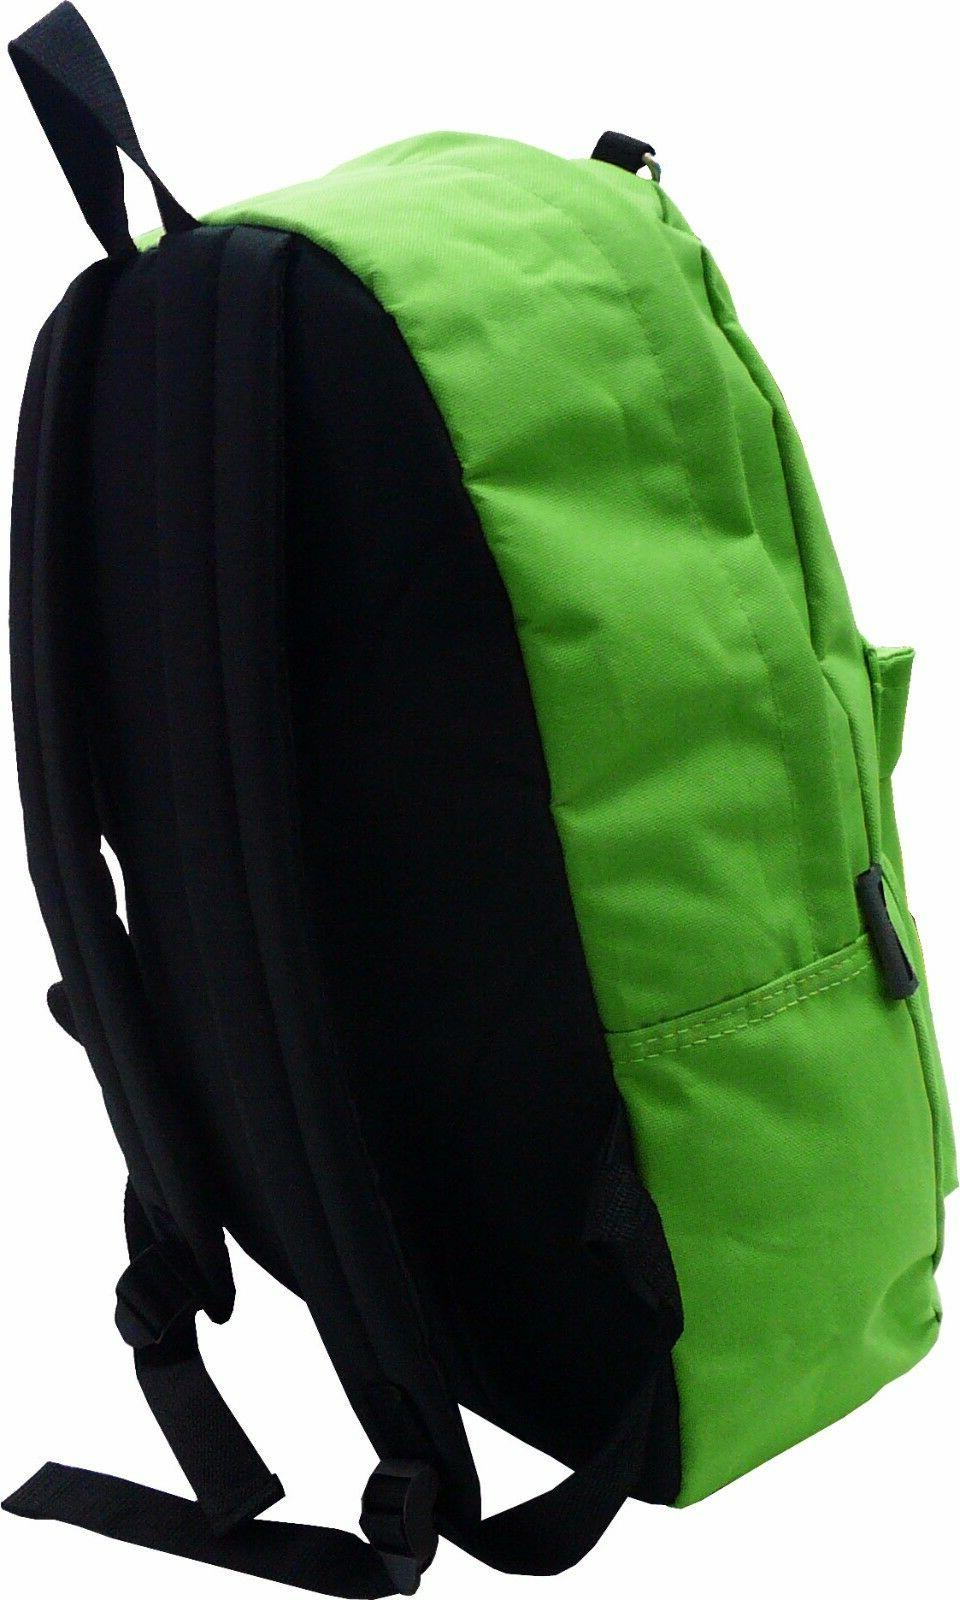 New Solid Emoji School Backpack Travel / Hiking Bag